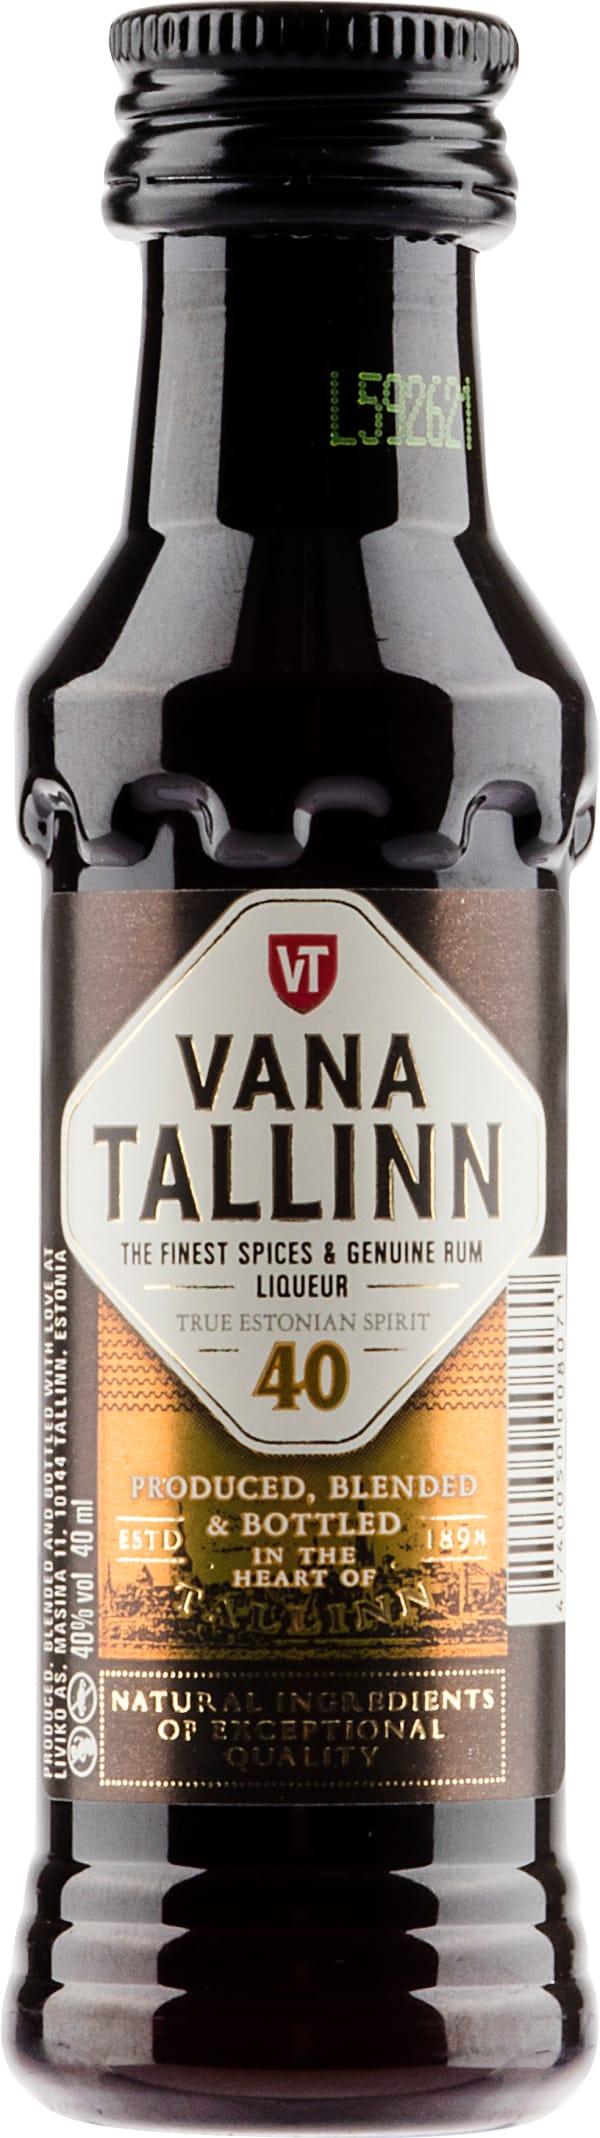 Vana Tallinn plastic bottle